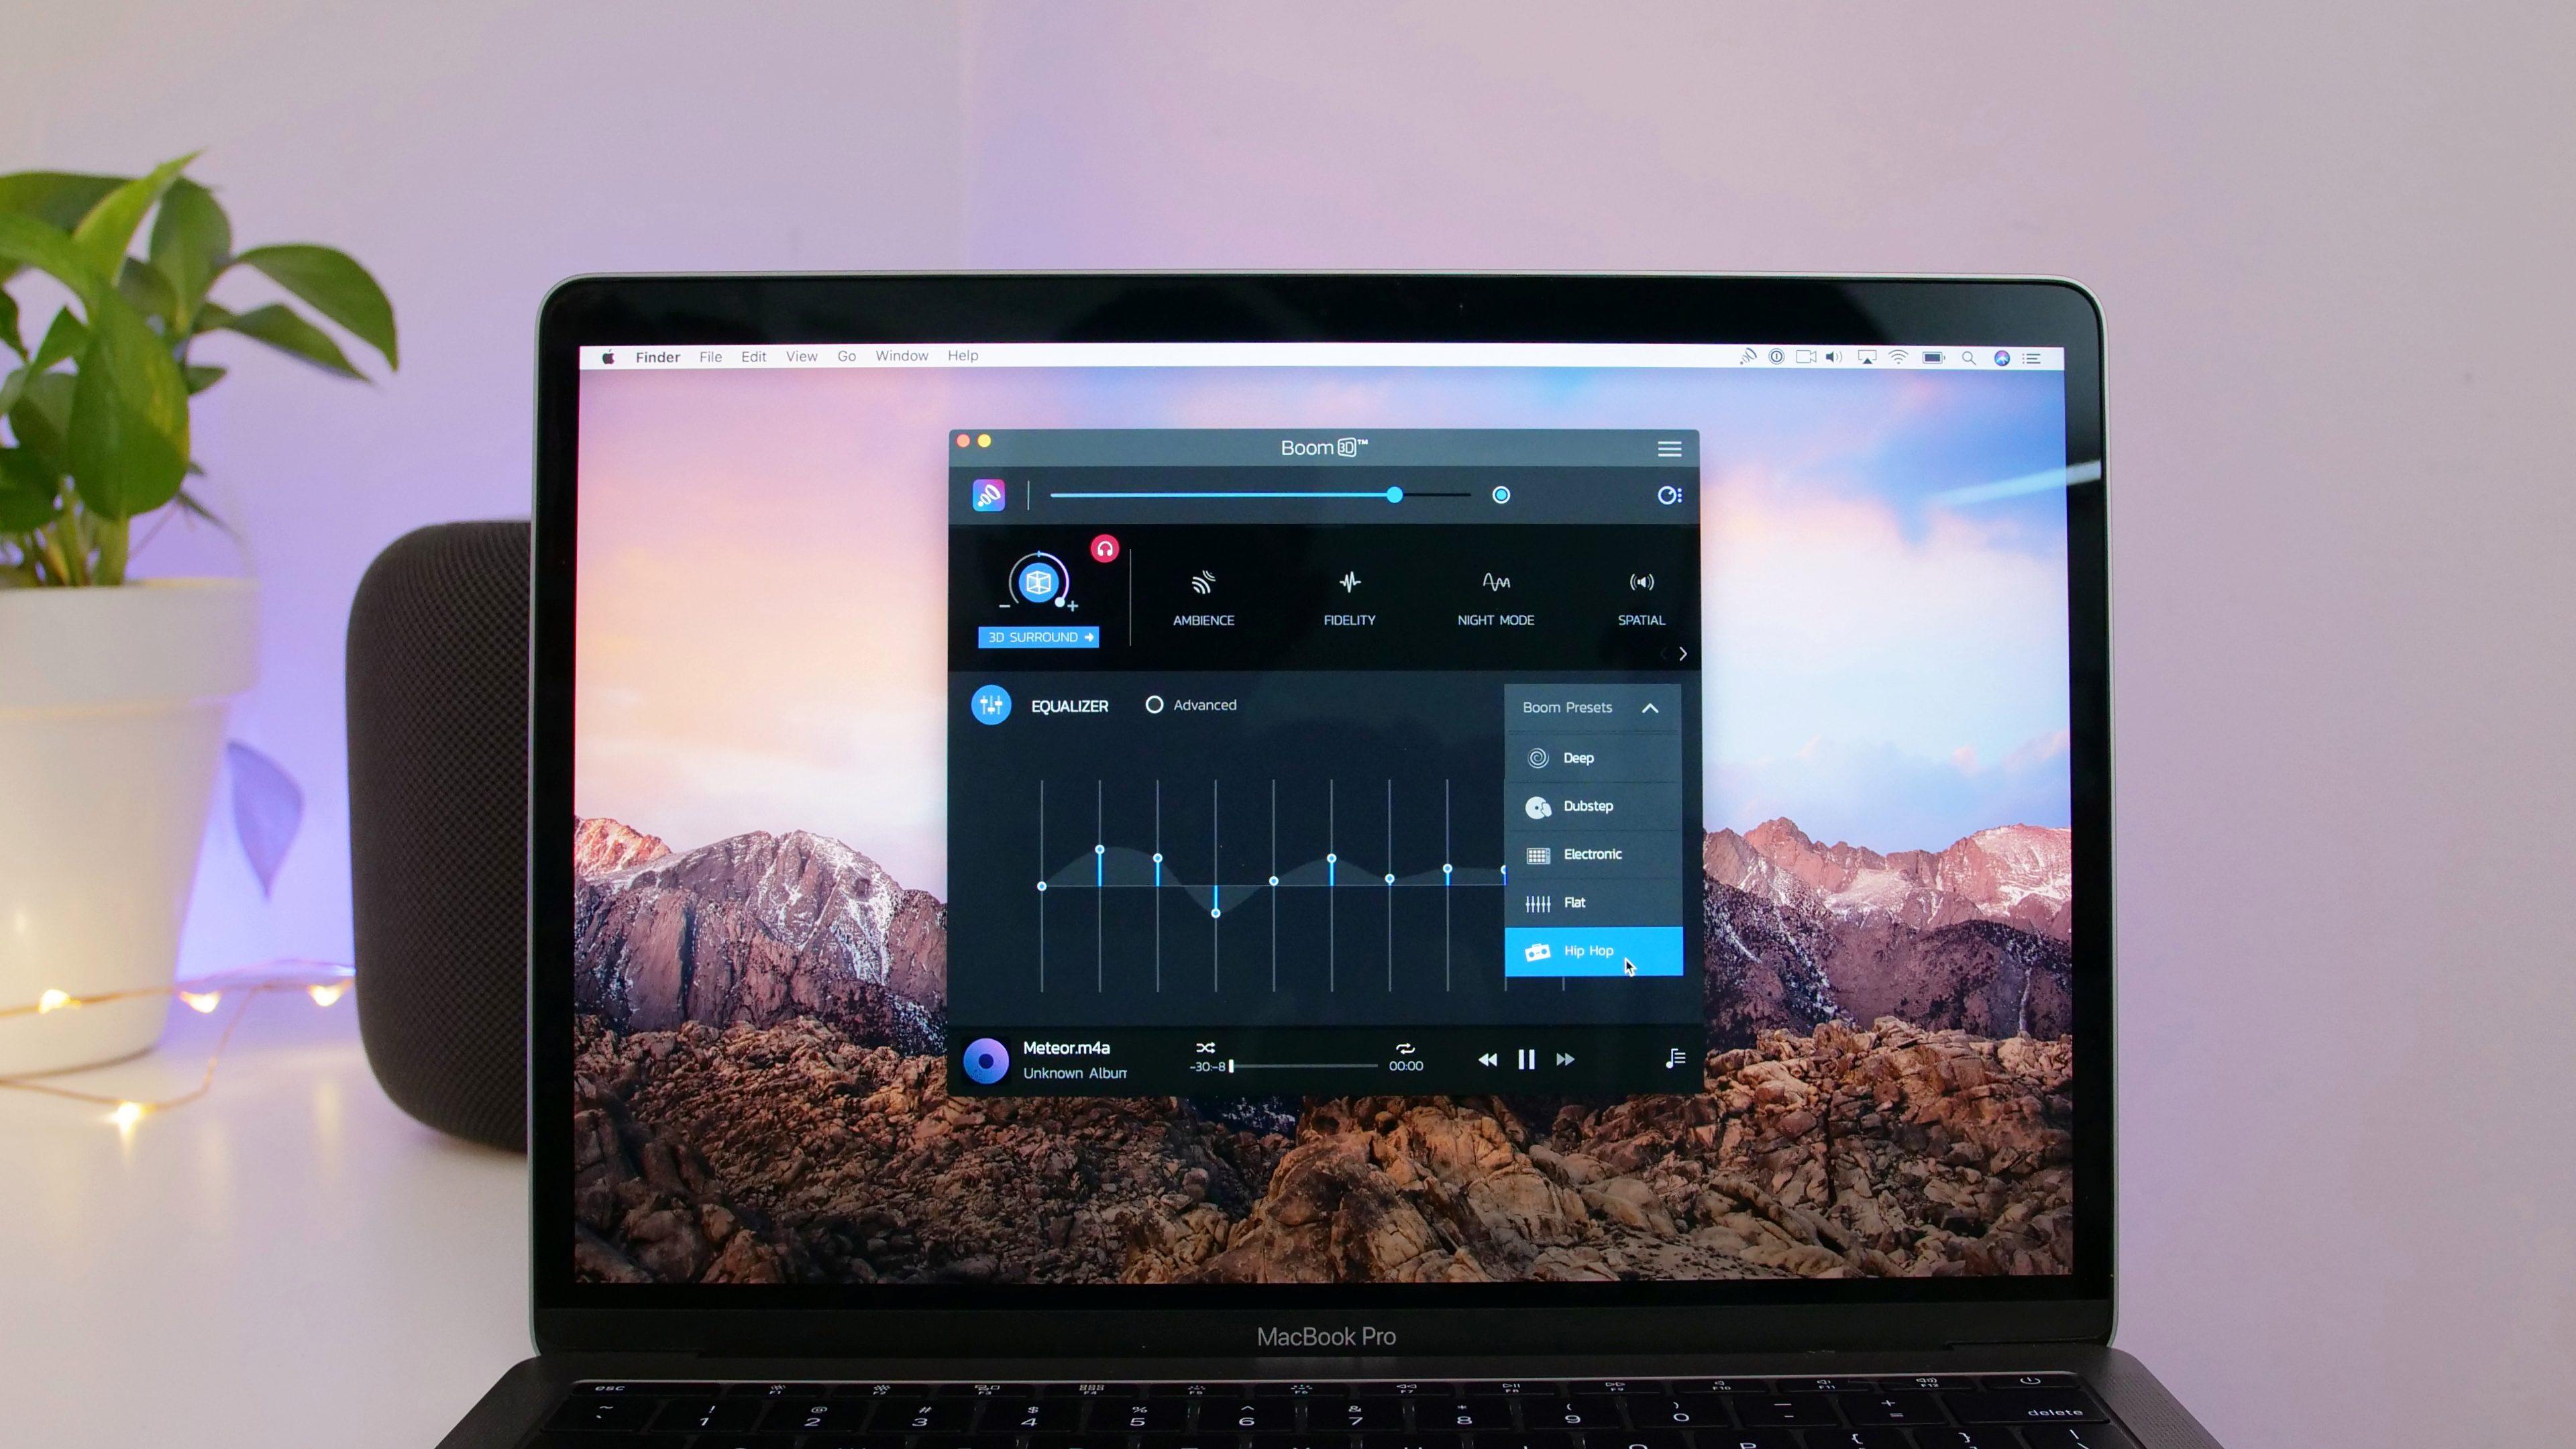 Get Boom 3D advanced EQ app & volume booster for Mac and iOS $11.89 (Reg. $16.99)